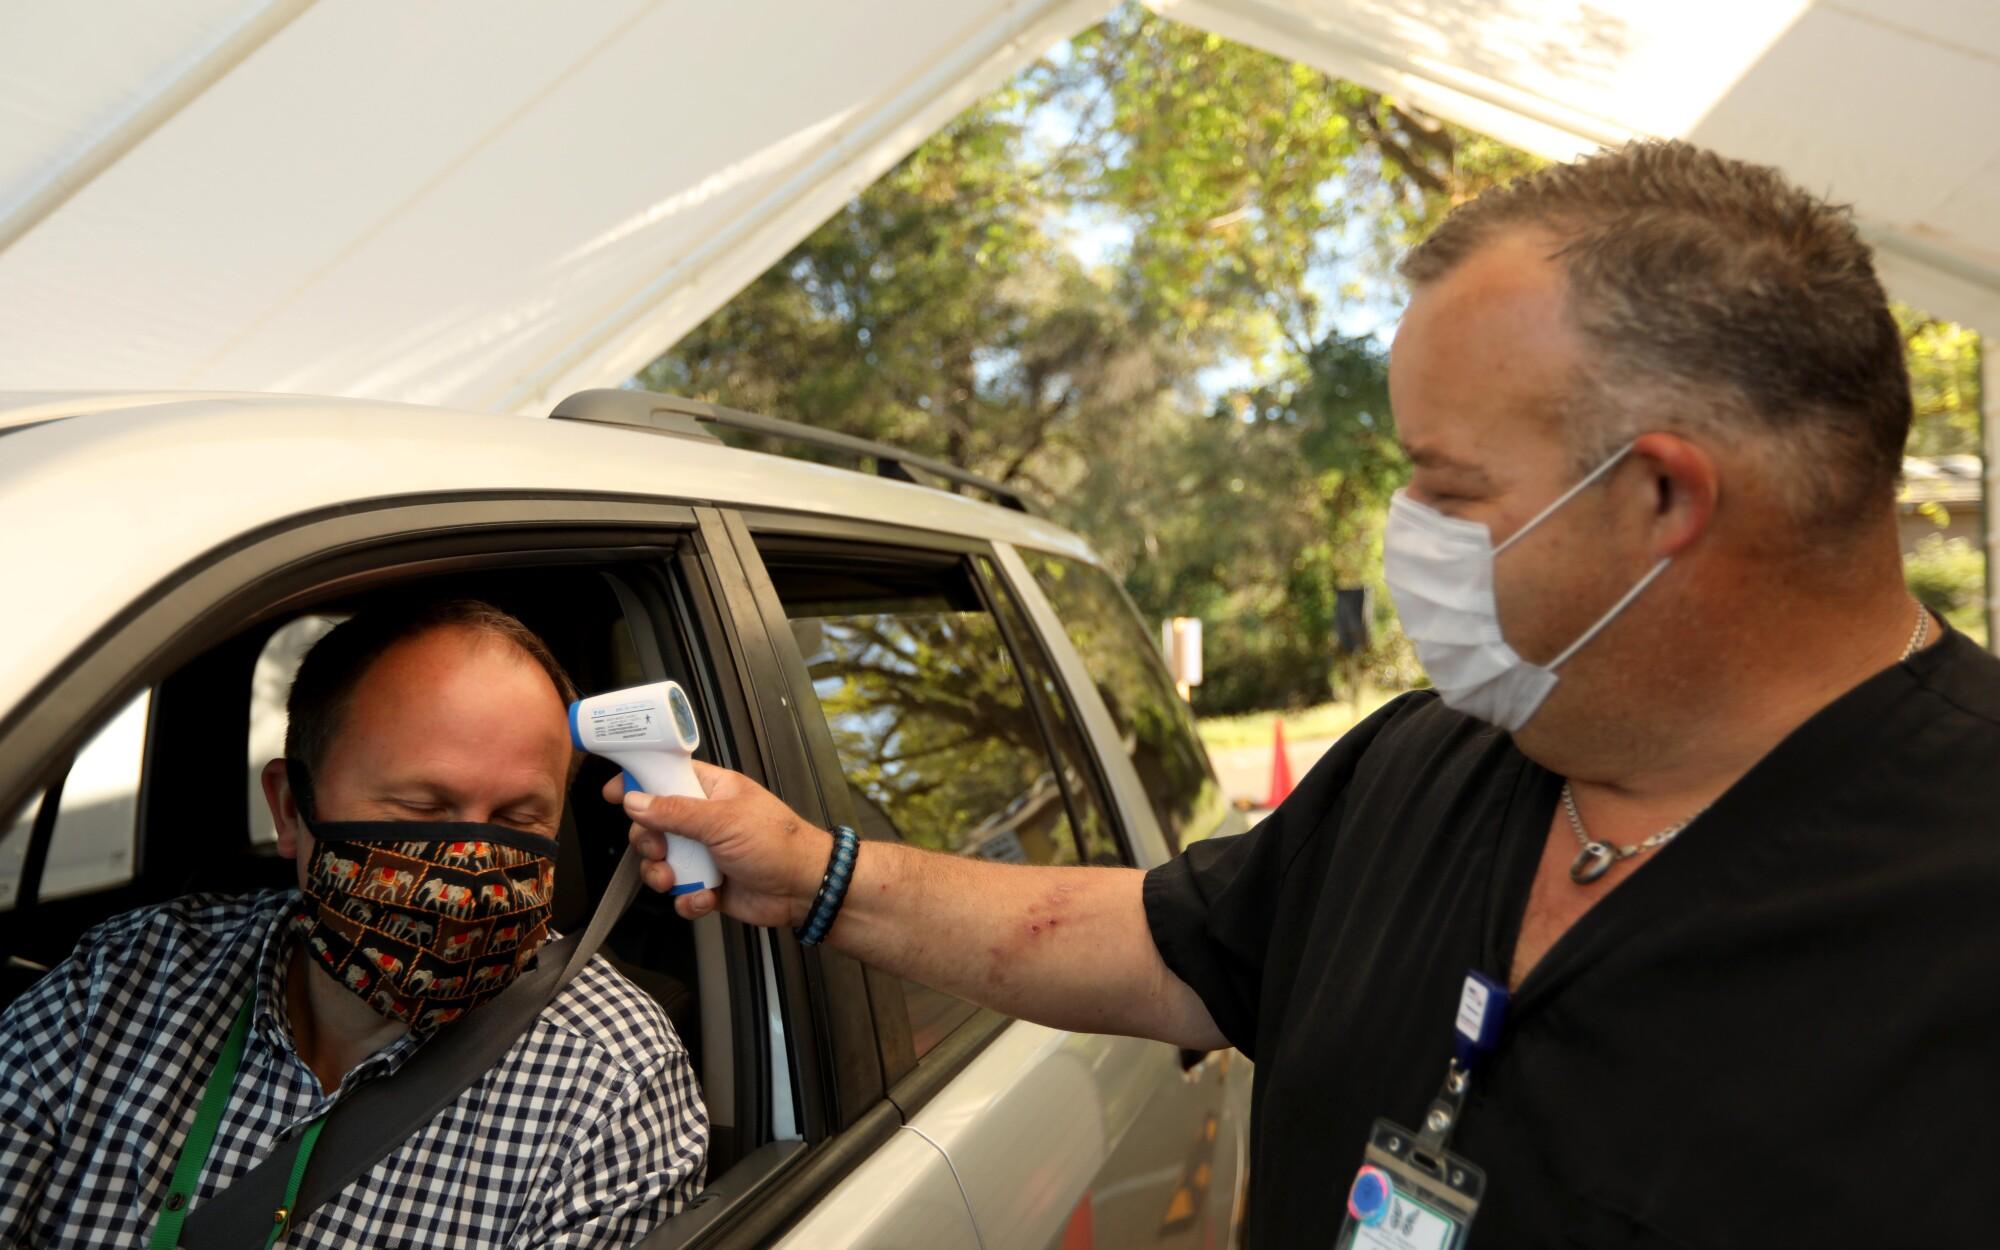 Matthew Matthiessen, CEO of John C. Fremont Hospital, has his temperature taken